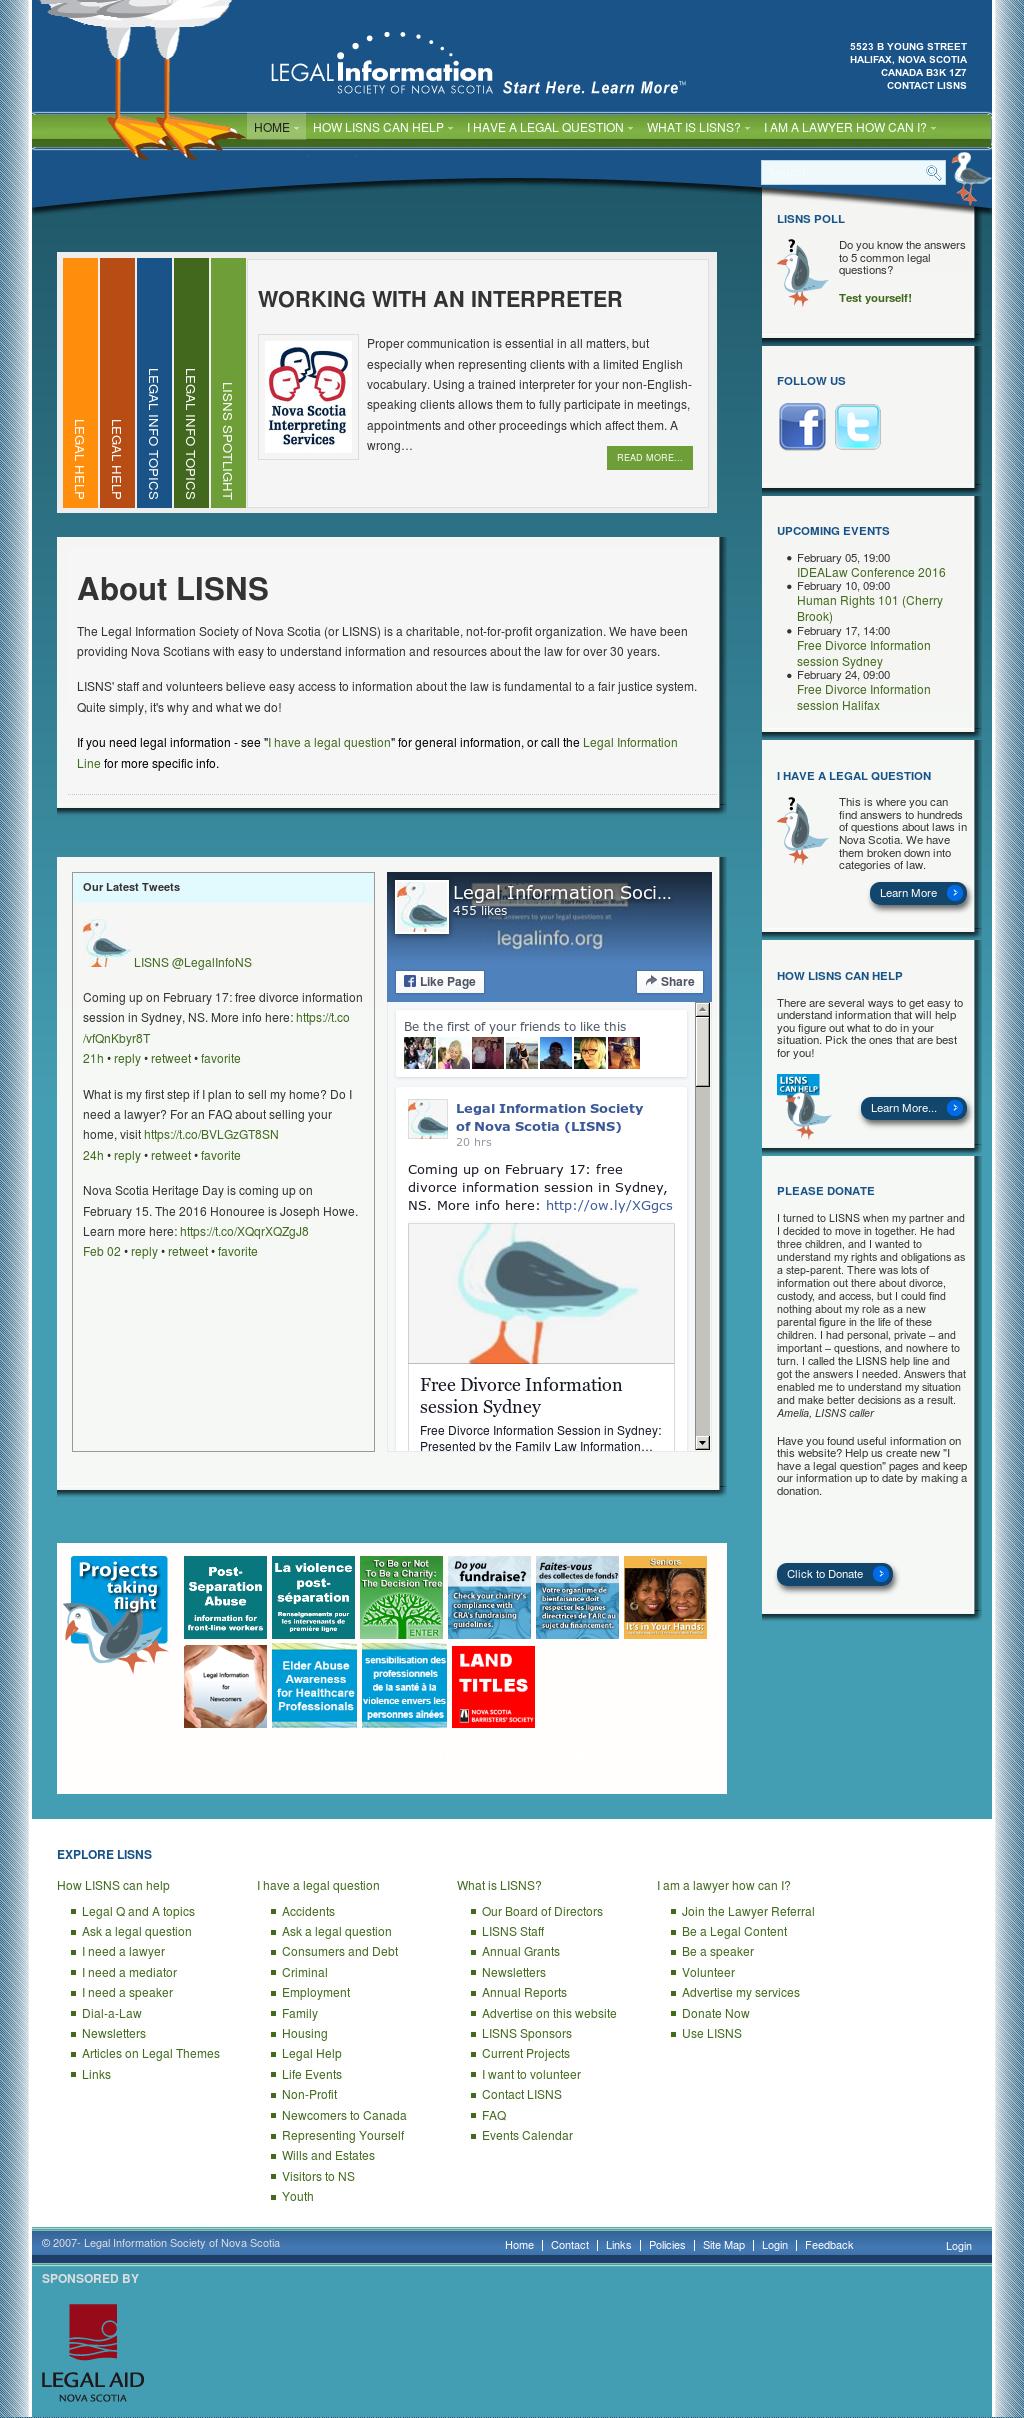 Legal information society of nova scotia competitors revenue and legal information society of nova scotia competitors revenue and employees owler company profile solutioingenieria Images